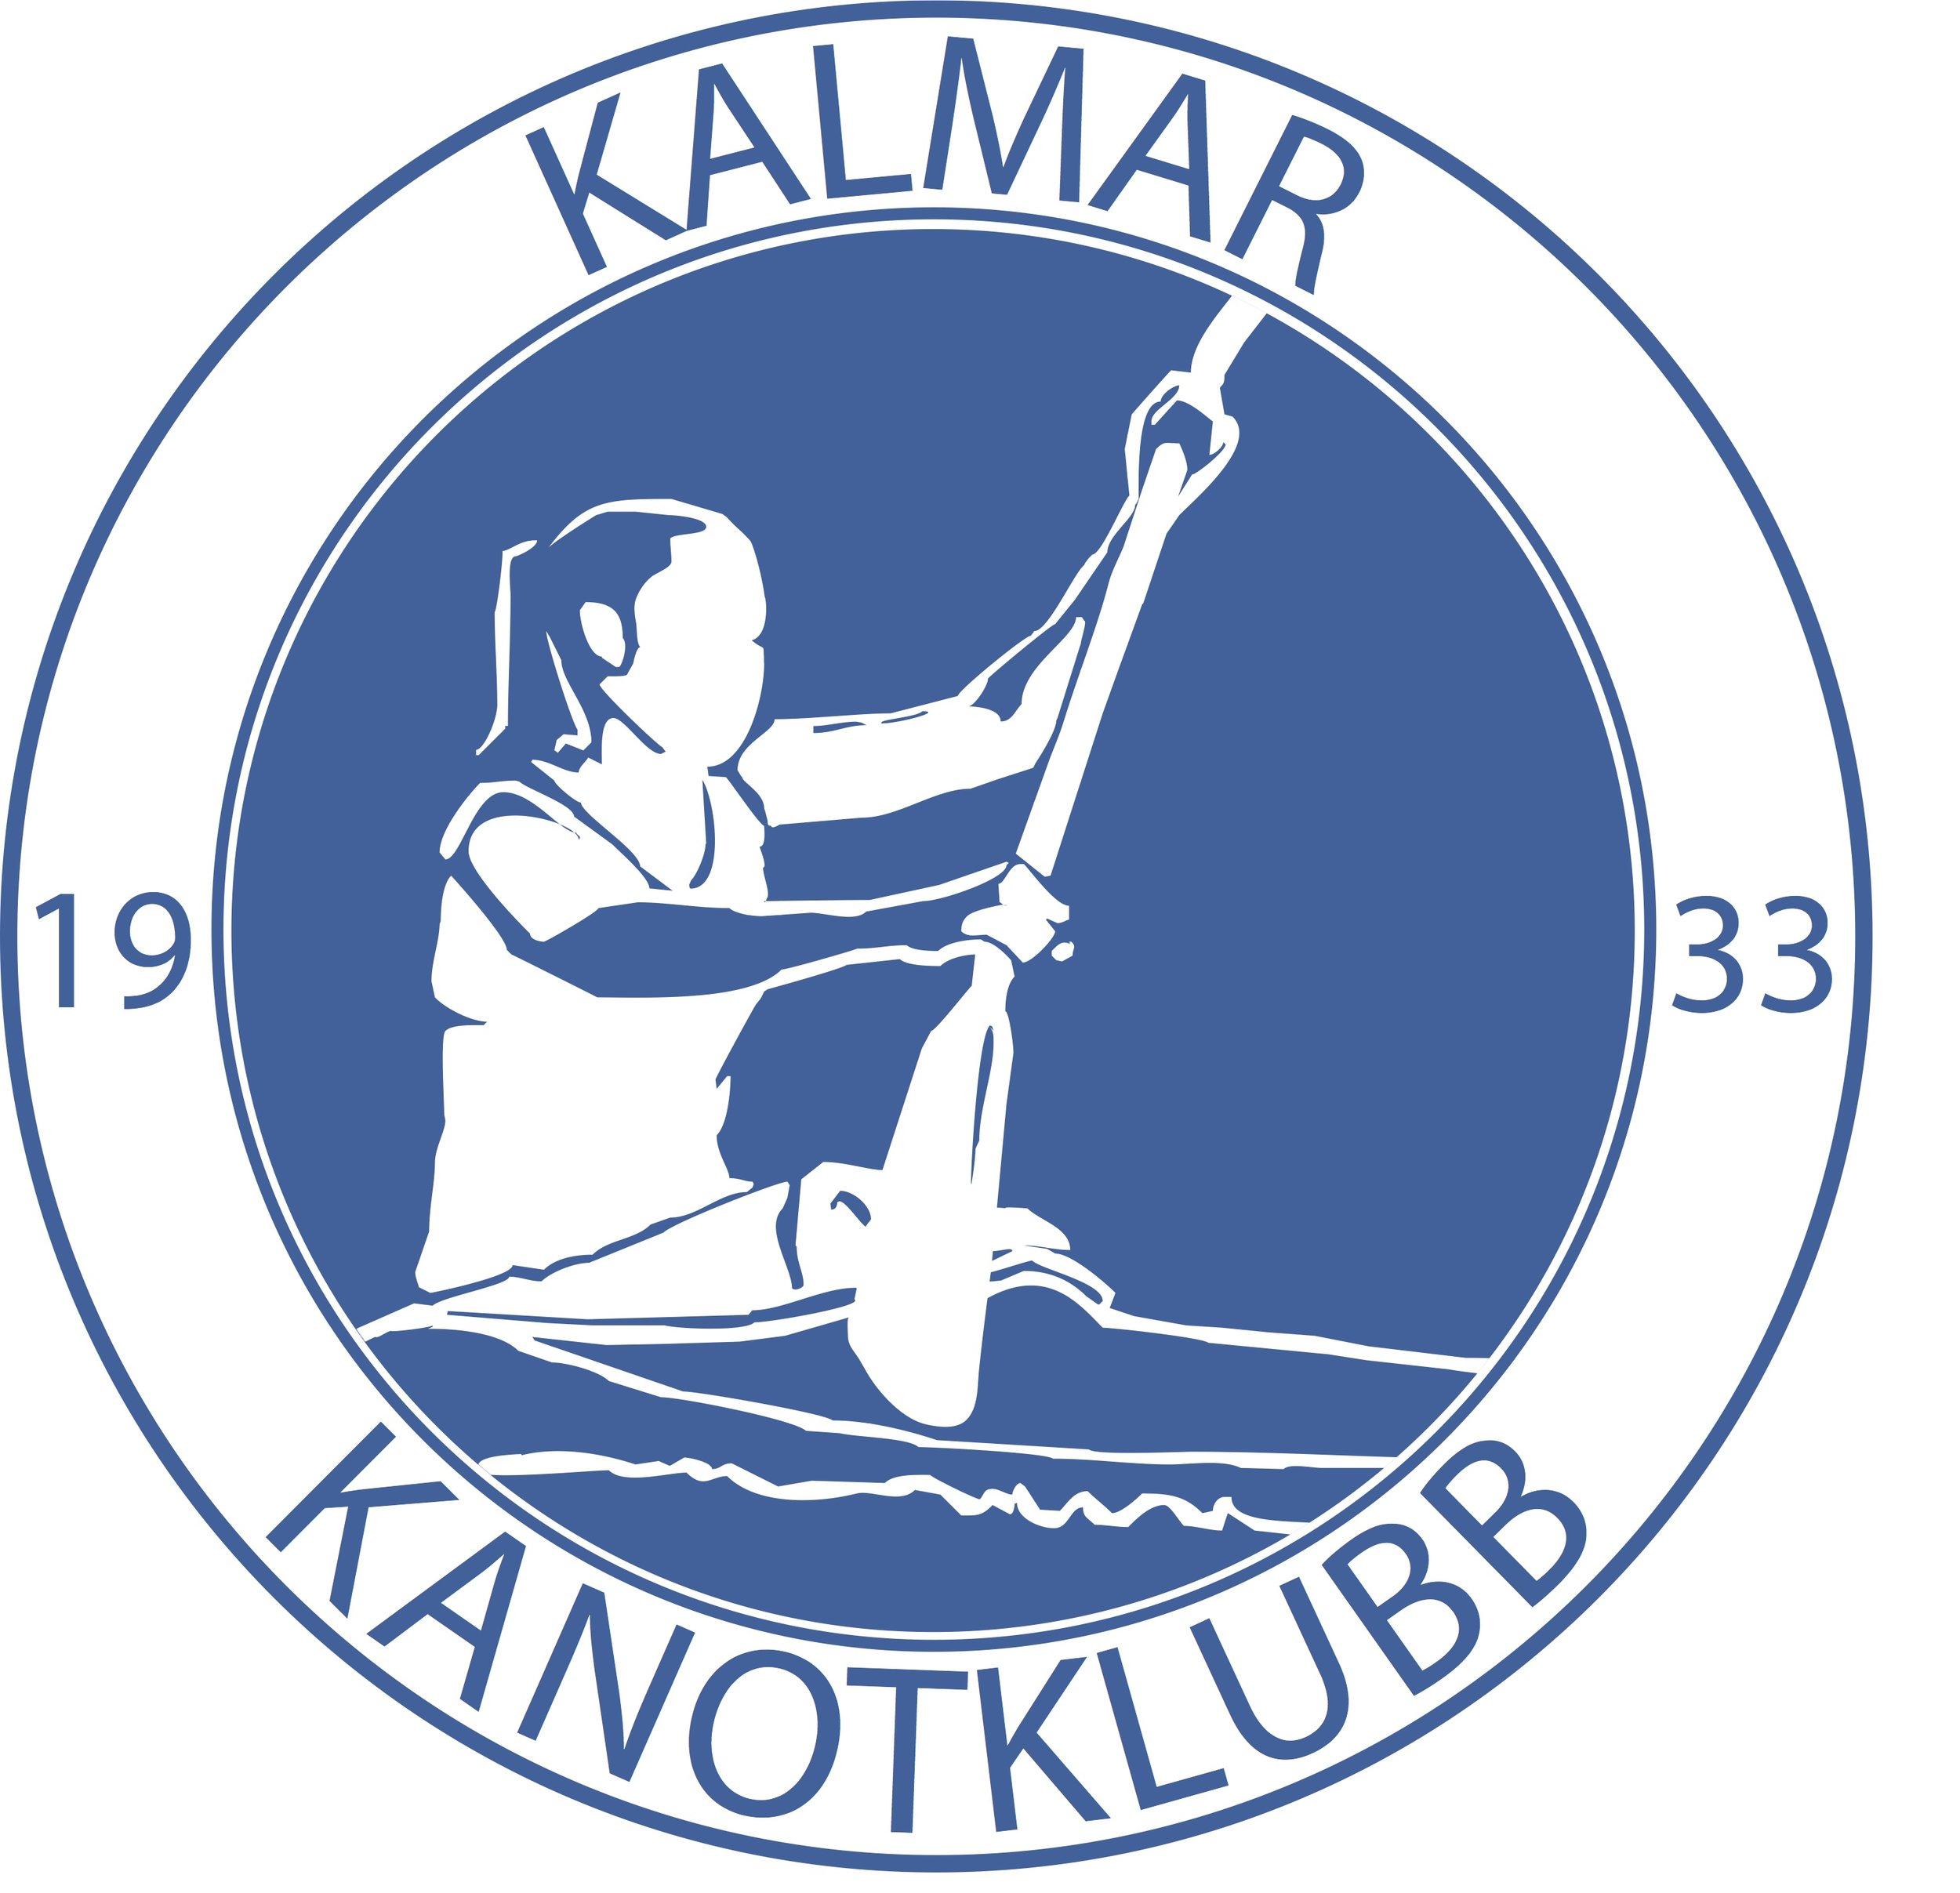 kalmar kanotklubb logo.jpg